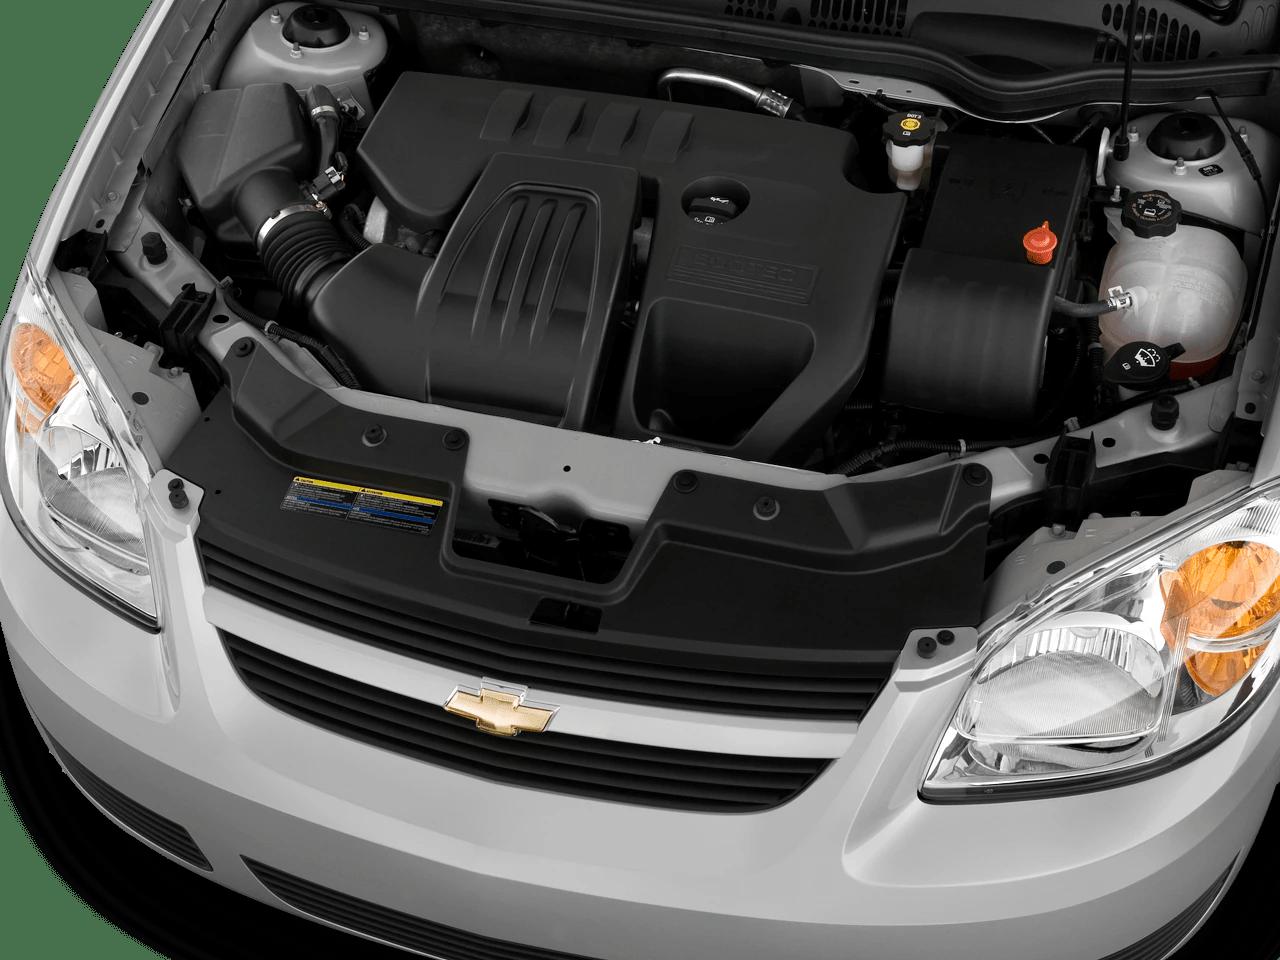 hight resolution of 2009 chevy cobalt lt engine diagram